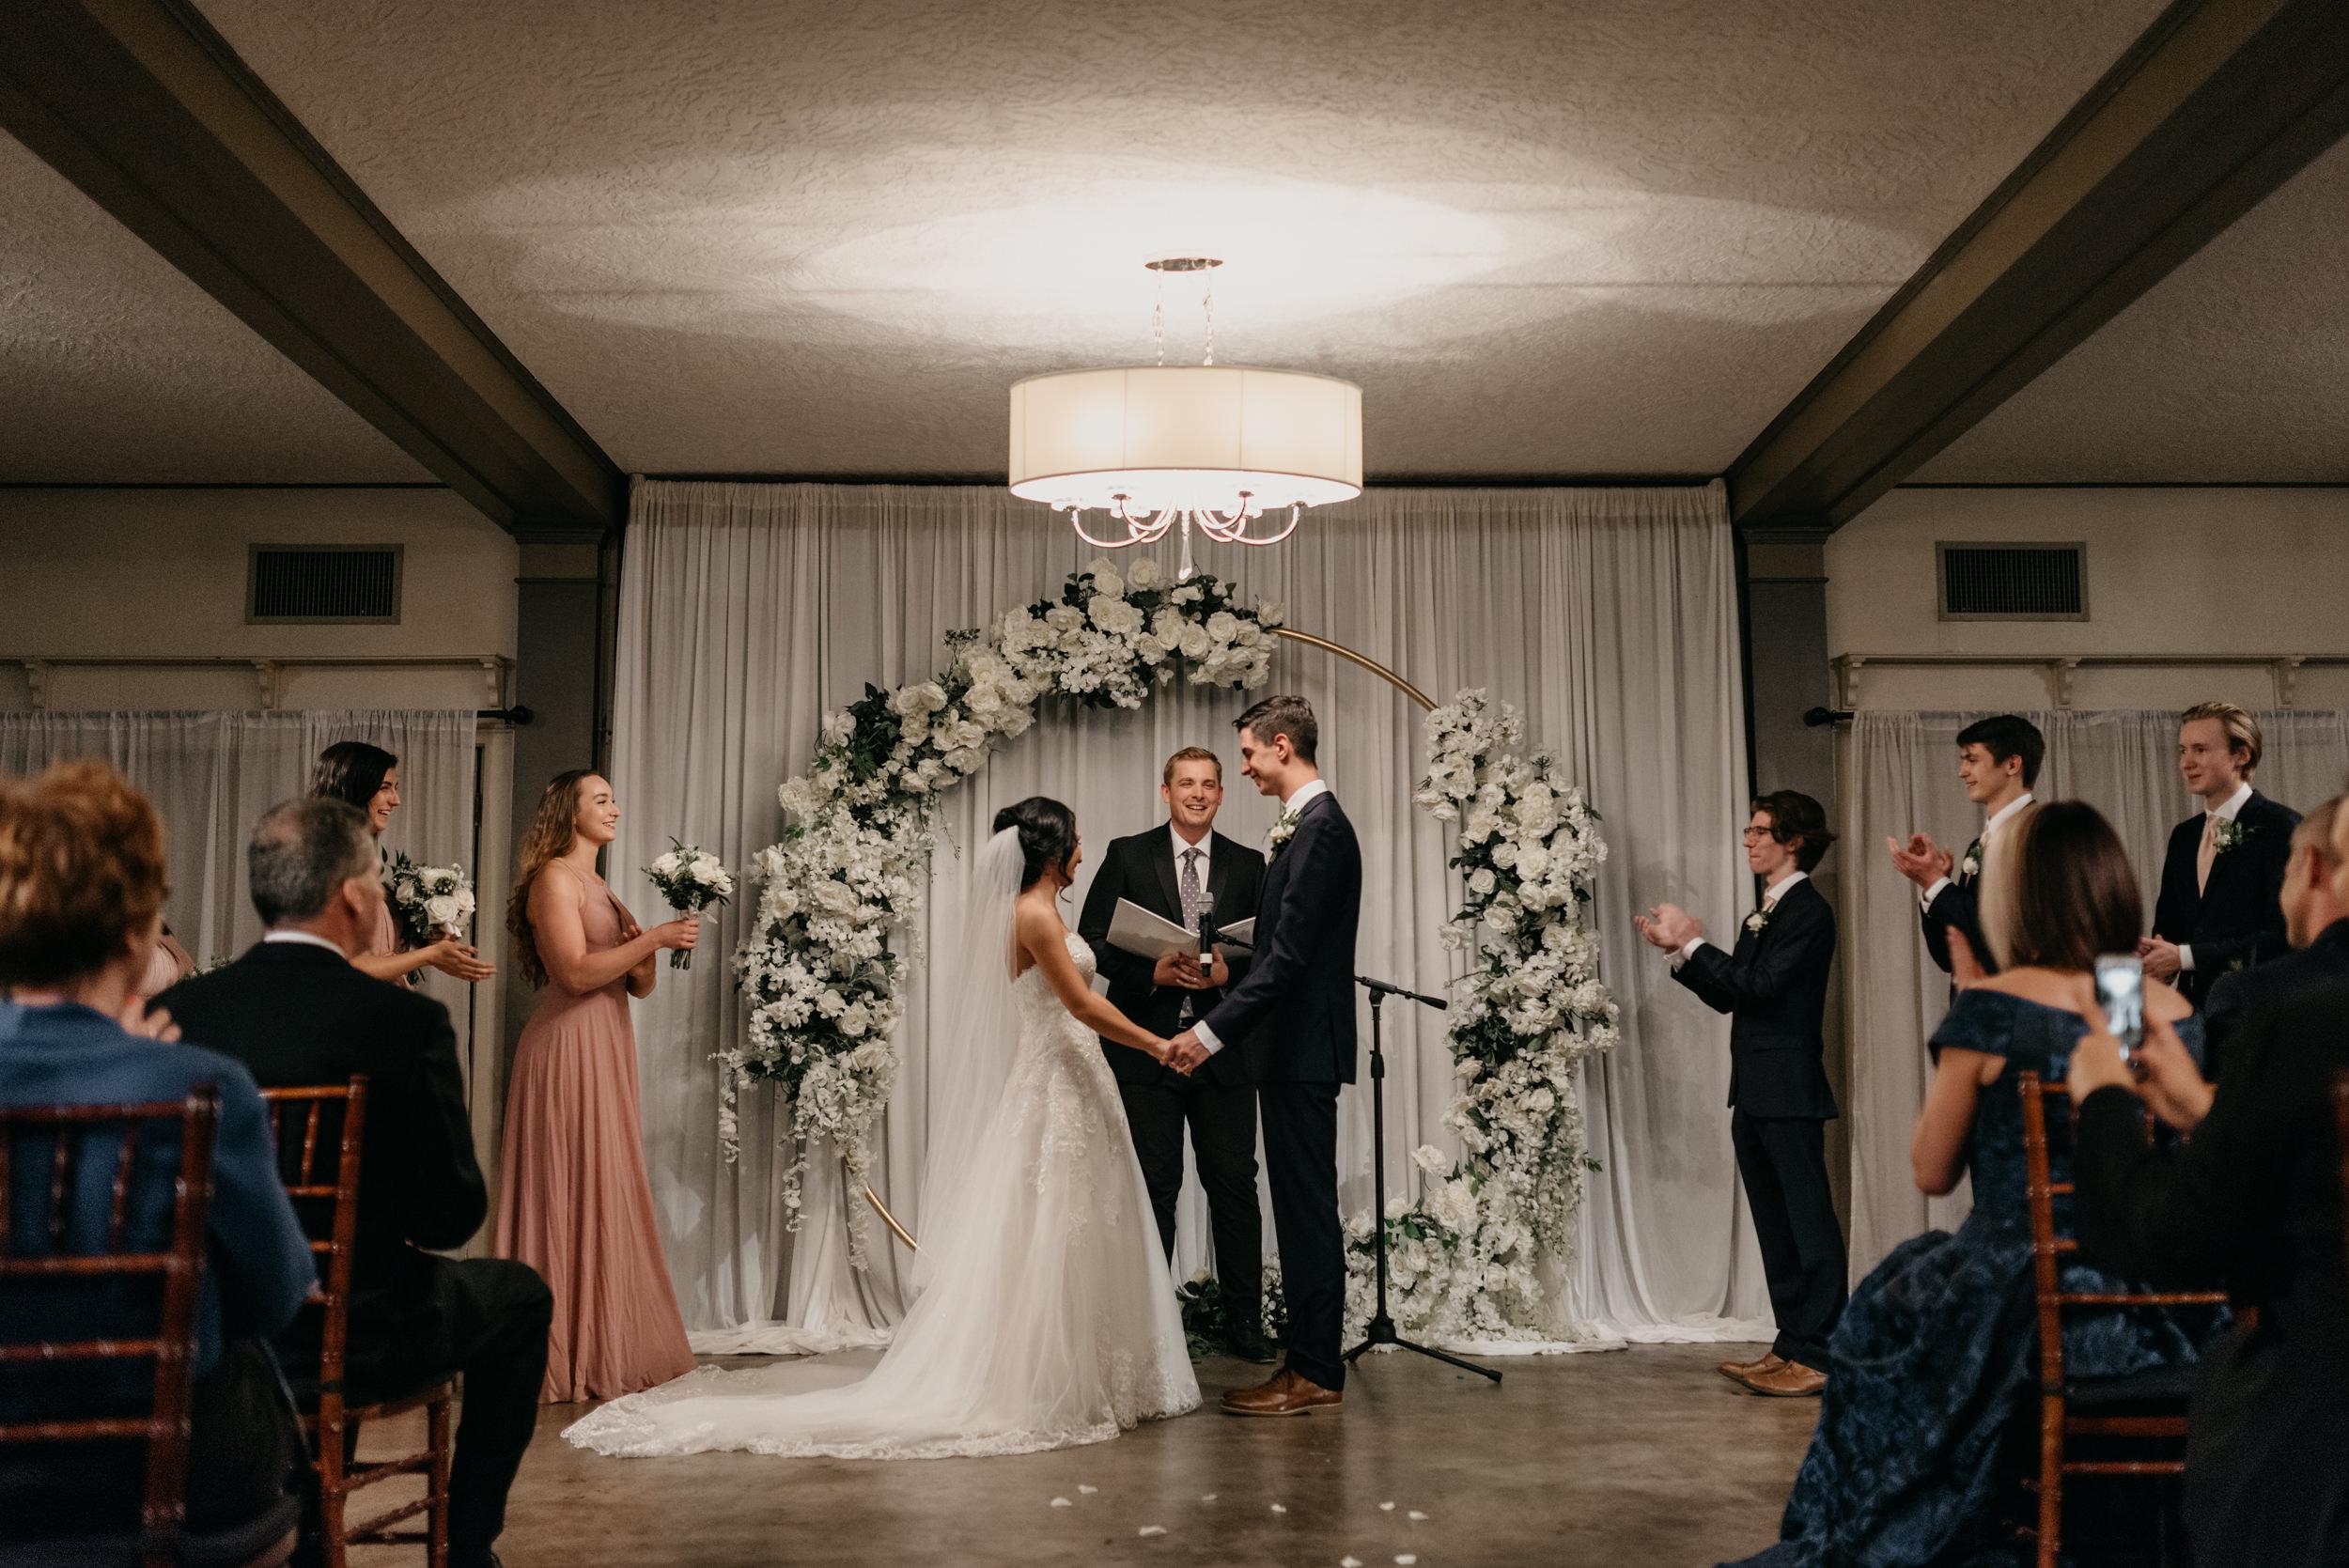 94-ceremony-west-end-ballroom-portland-wedding-venue-8012.jpg